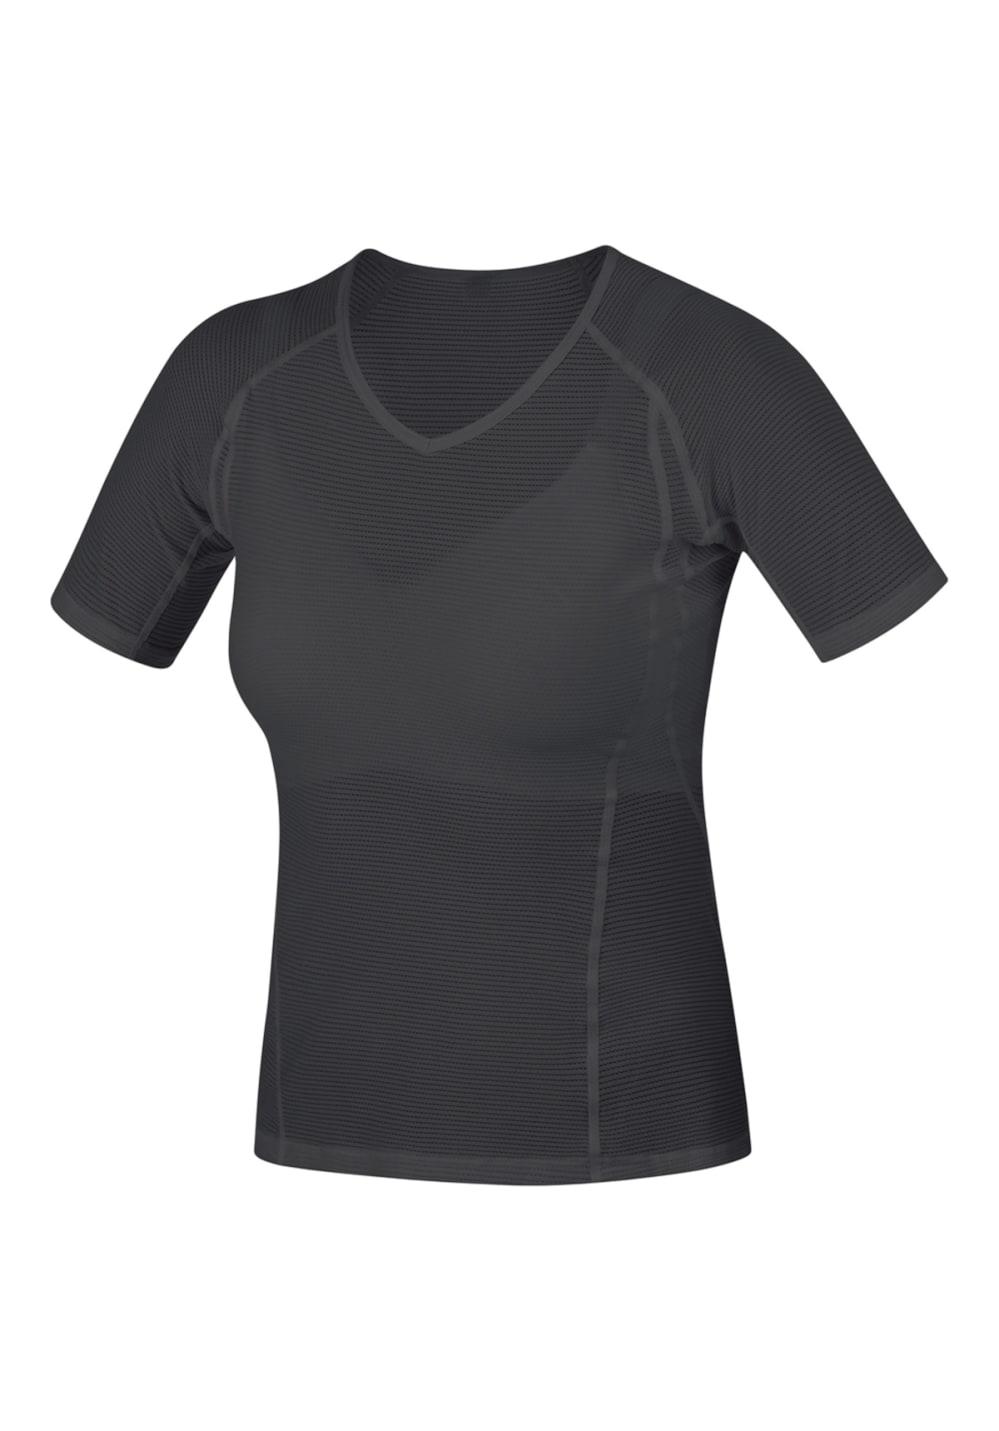 Gore bike wear base layer shirt triathlon for women for Womens base layer shirt